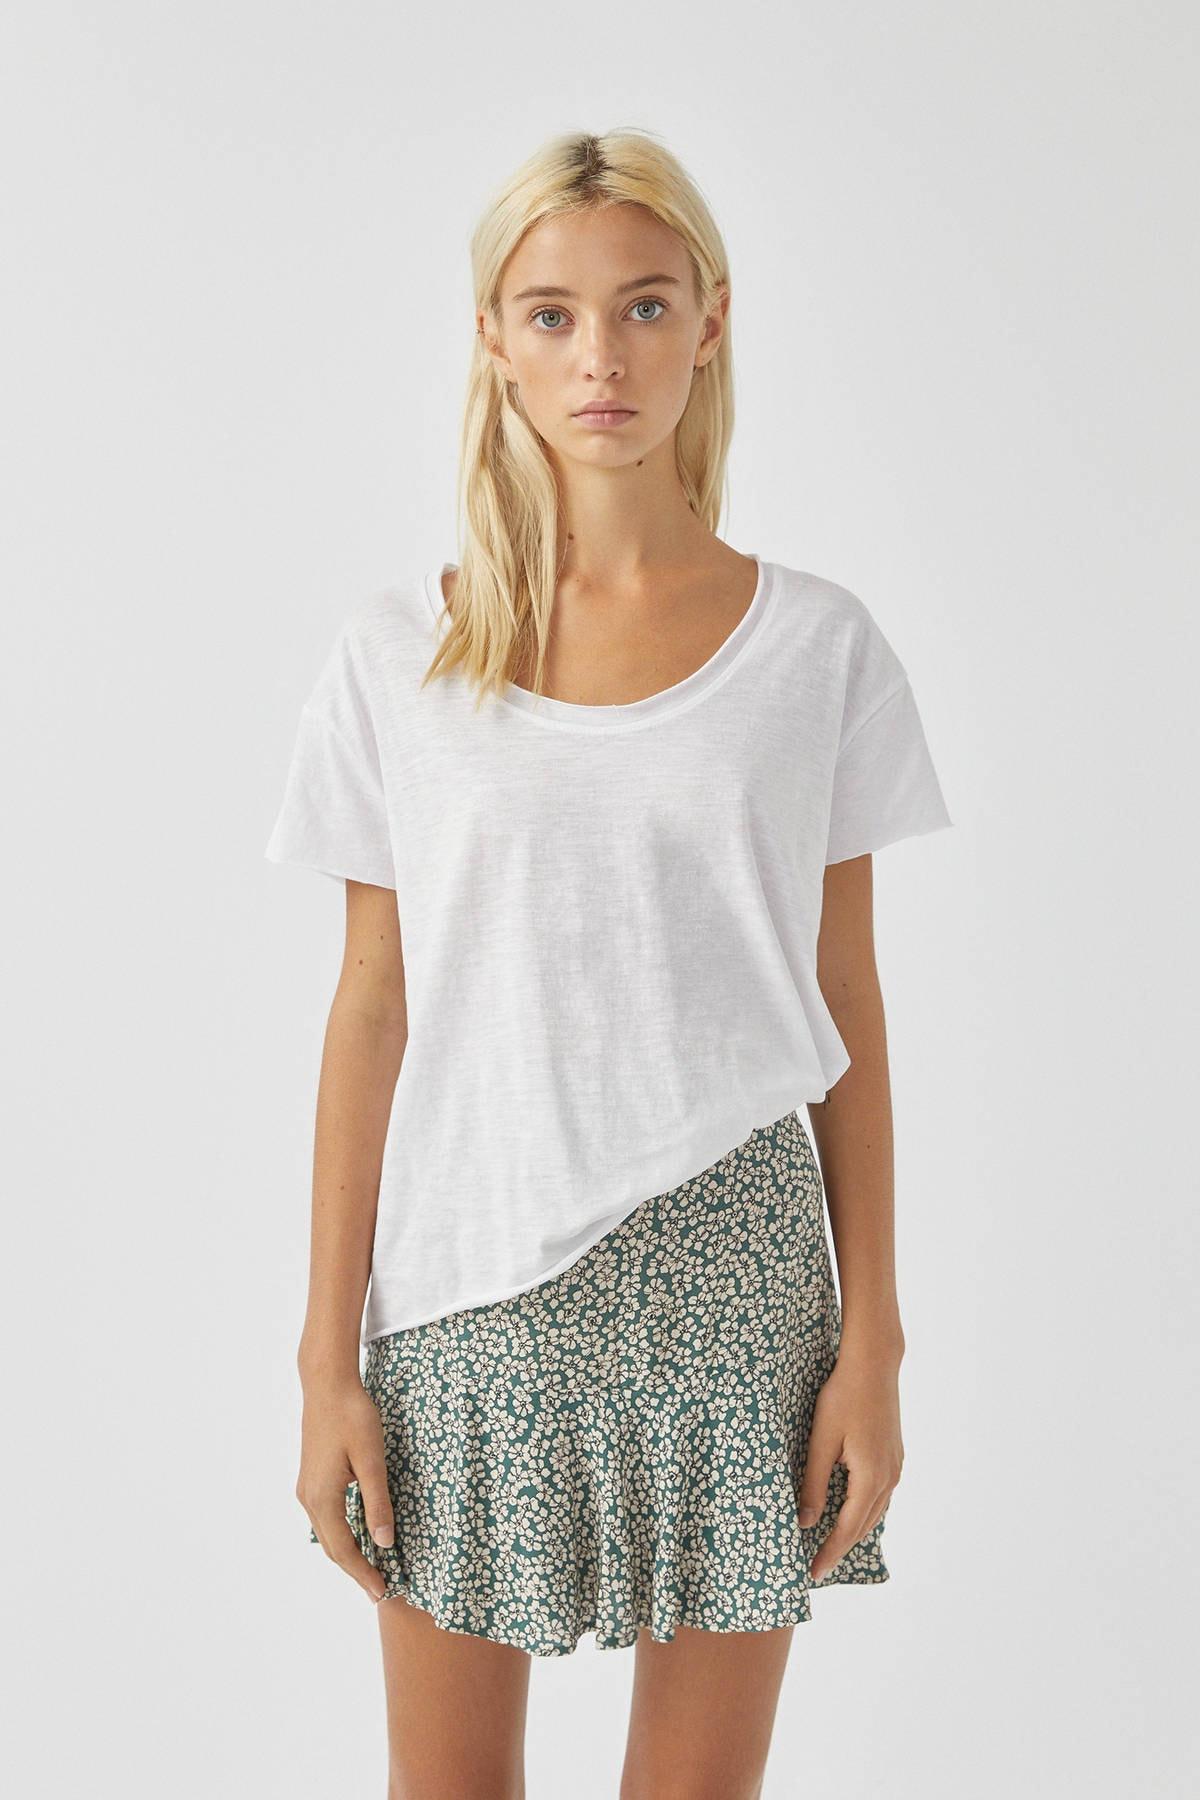 Pull & Bear Kadın Beyaz Biyeli Dikişli Basic T-Shirt 05236307 0